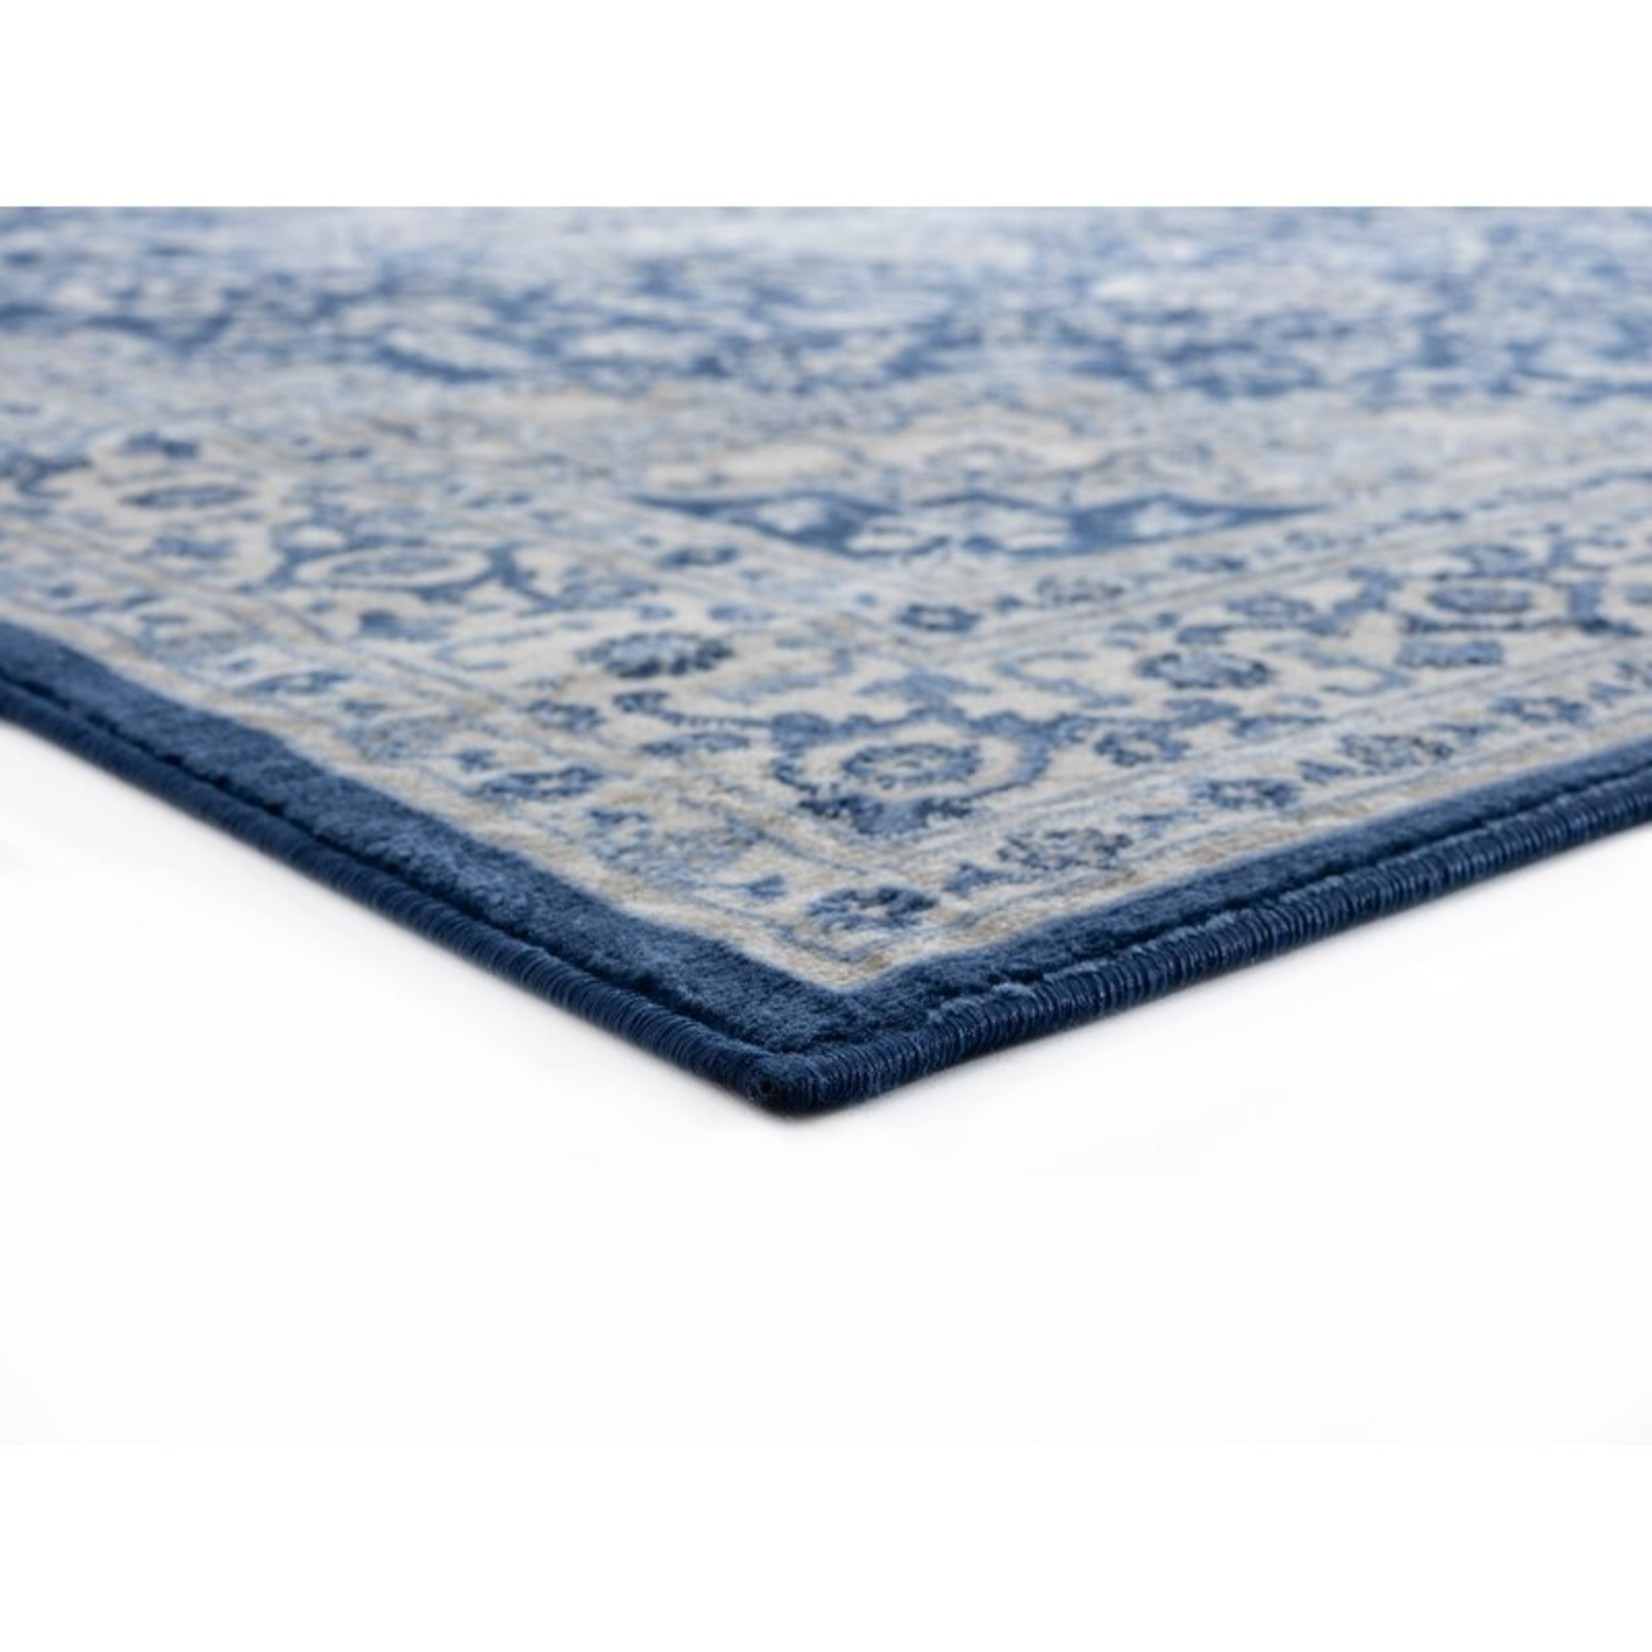 "*12'6"" x 15' - Olander Denim Blue Area Rug - Final Sale"